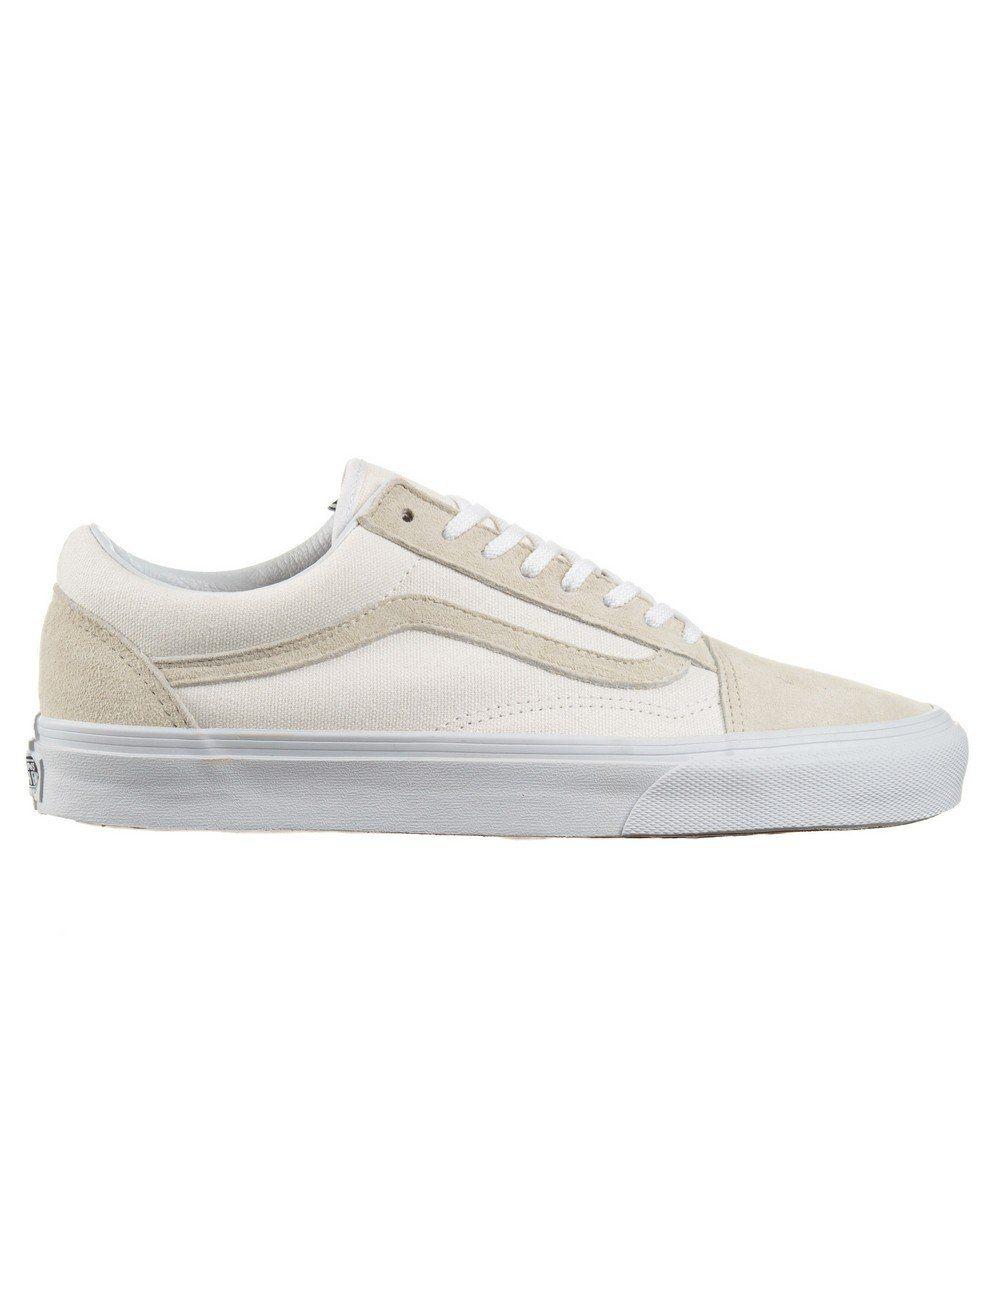 Vans California Old Skool Reissue Shoes - True White (Vansguard) Footwear  Whites @ Fat Buddha